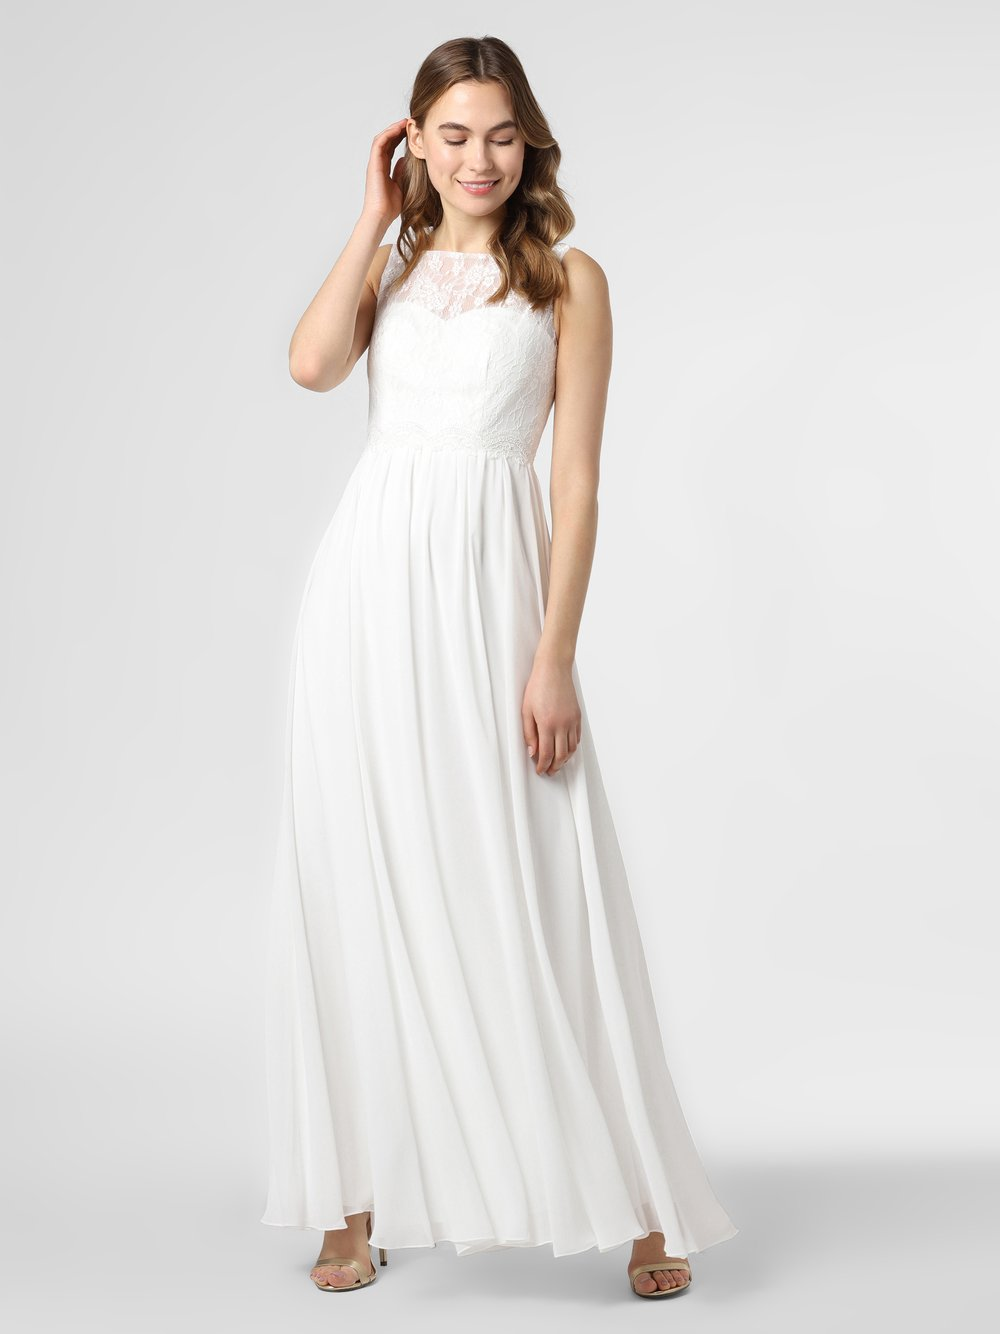 Luxuar Fashion – Damska suknia ślubna, beżowy Van Graaf 459217-0001